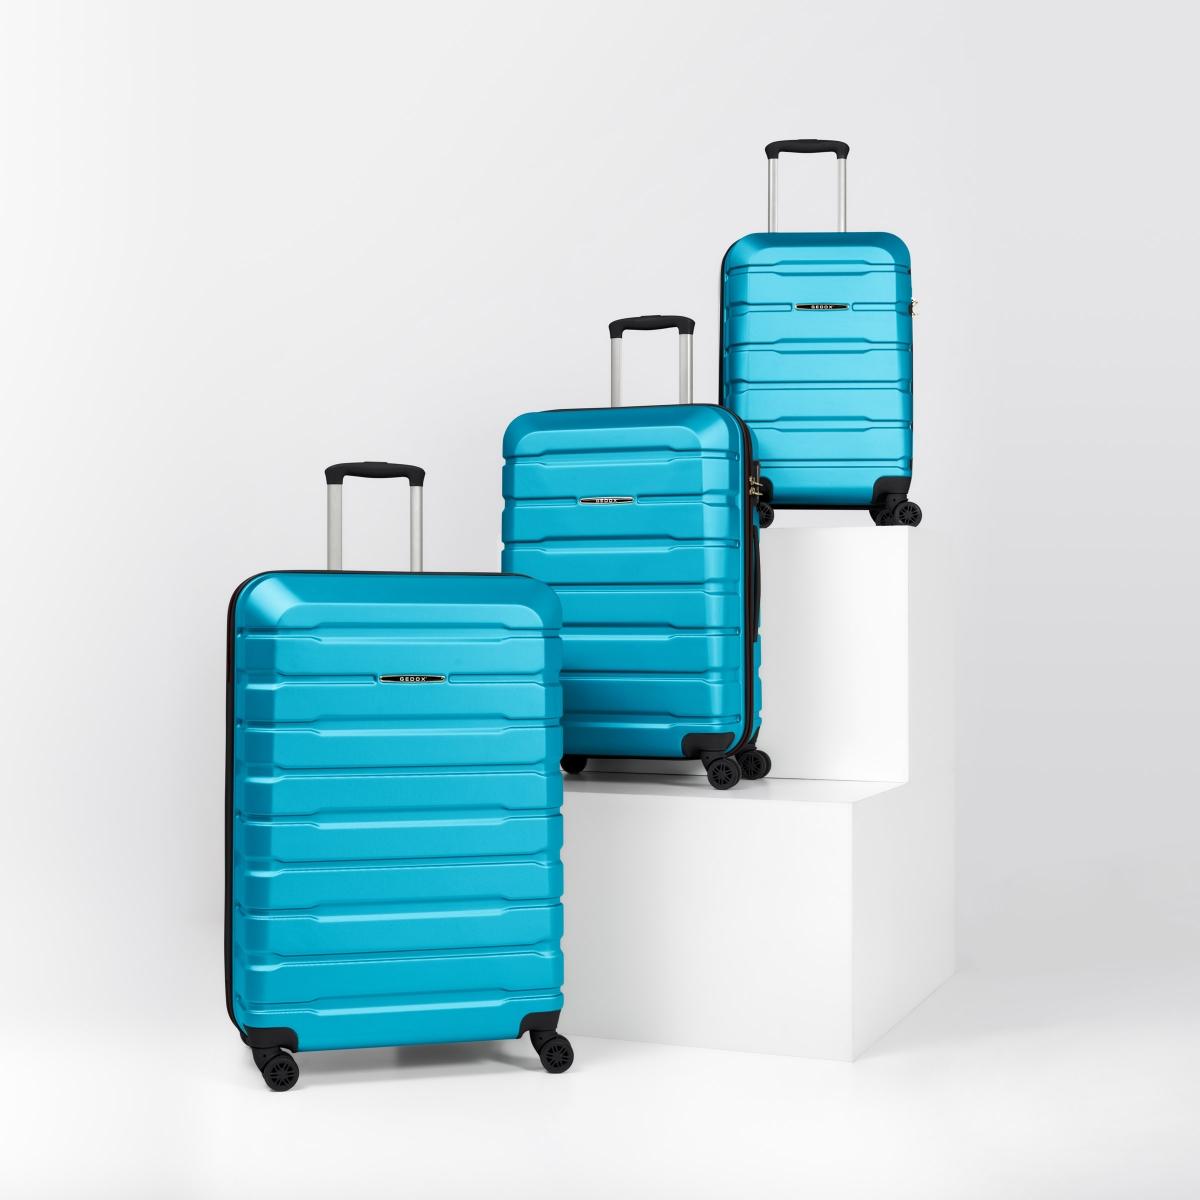 Gedox Abs Premium Tonaton 3'lü Valiz Seyahat Seti - Model:500.16 Turkuaz